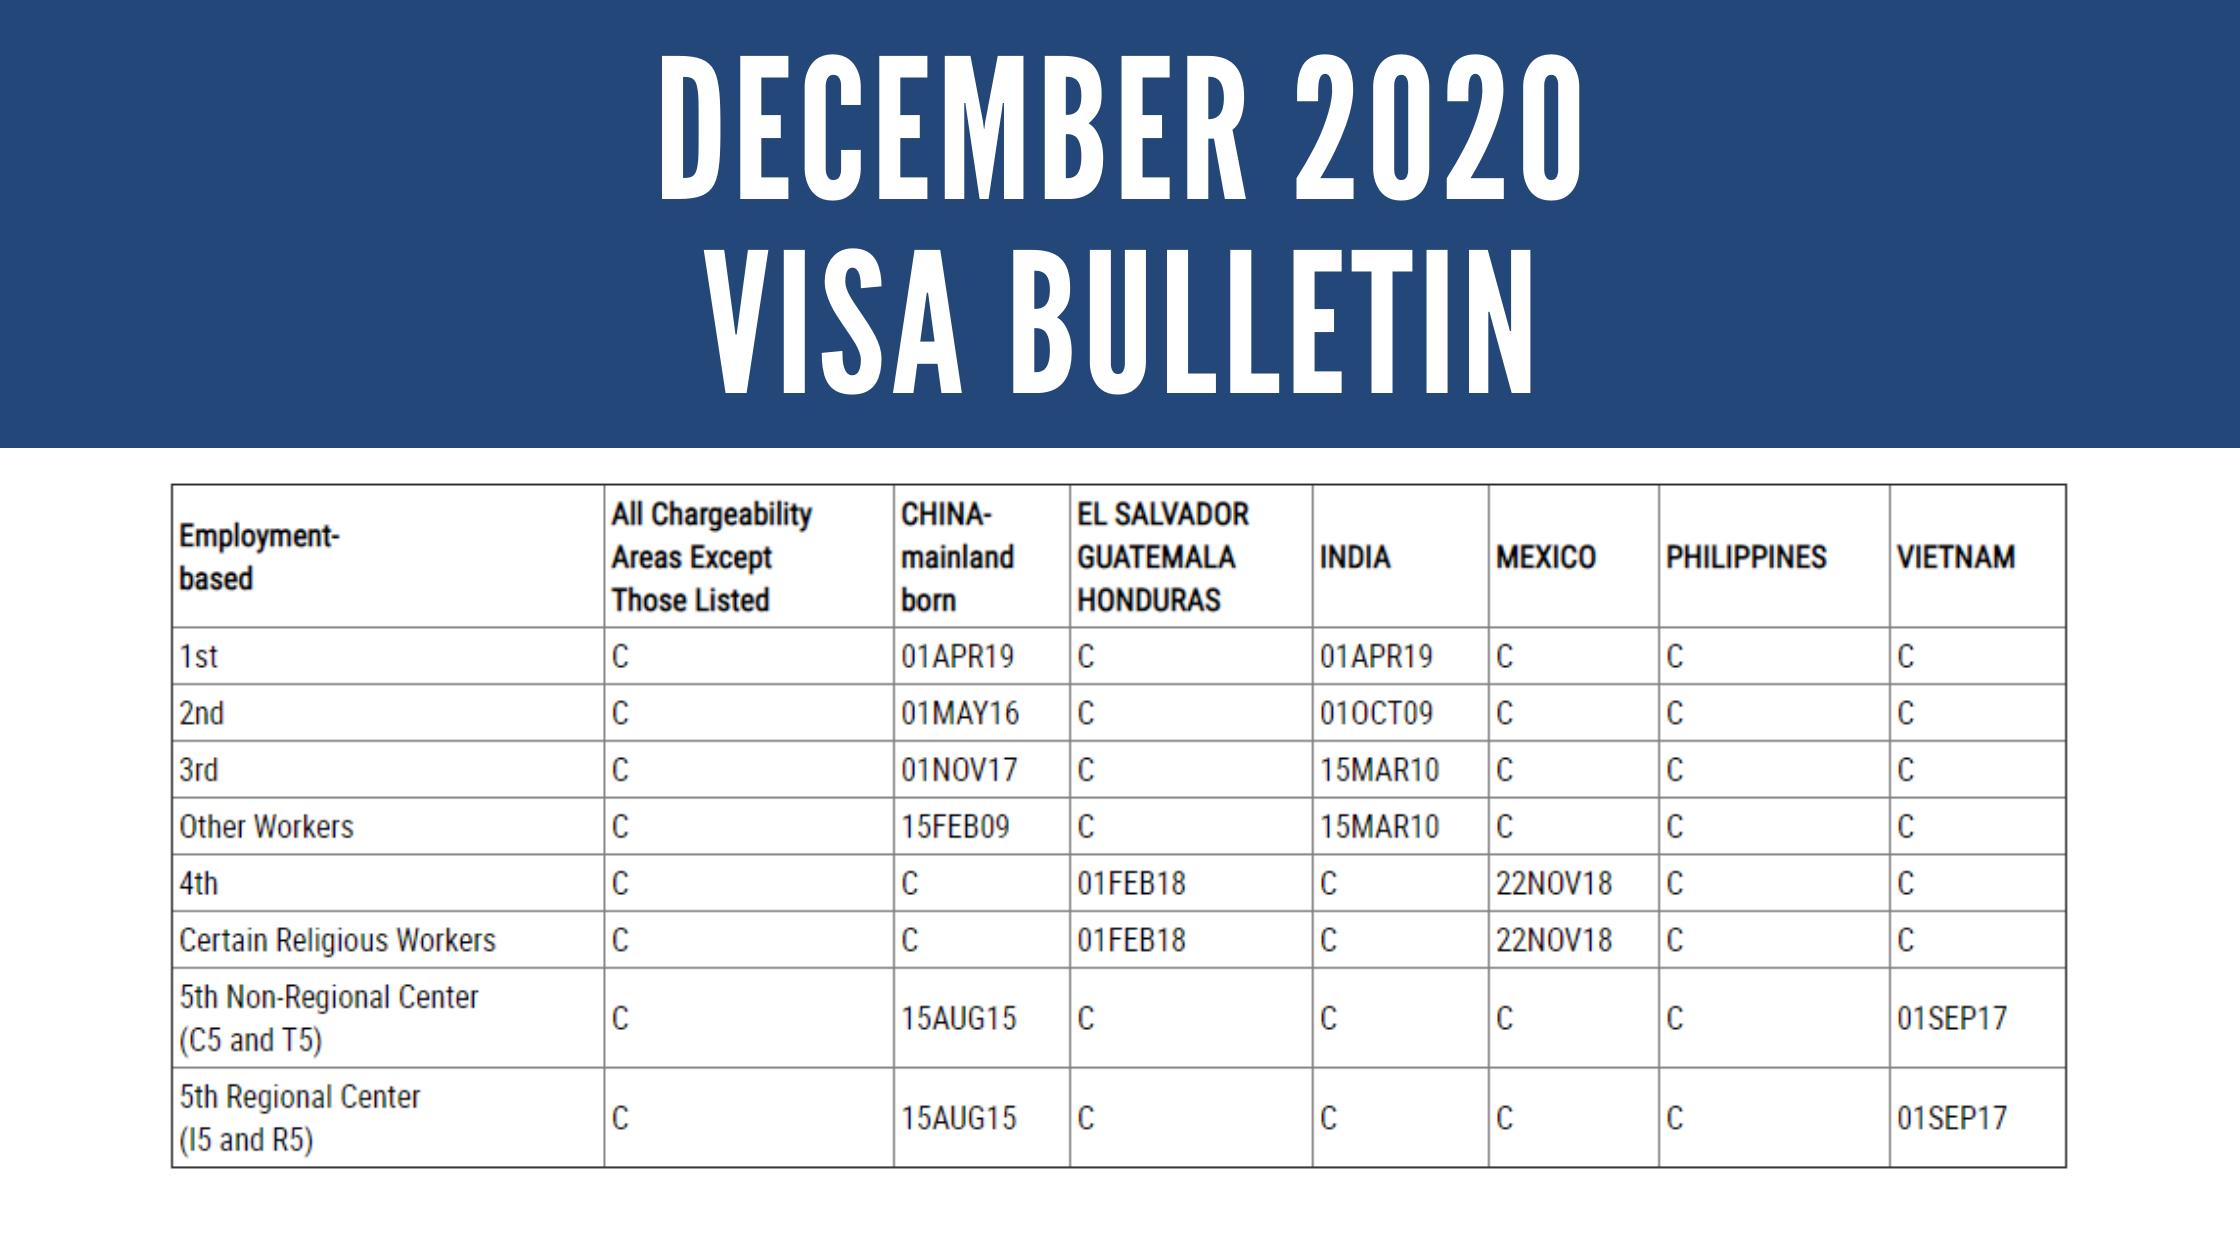 ban-tin-visa-eb-5-thang-12-2020-tin-hieu-lac-quan-cho-cac-nha-dau-tu-viet